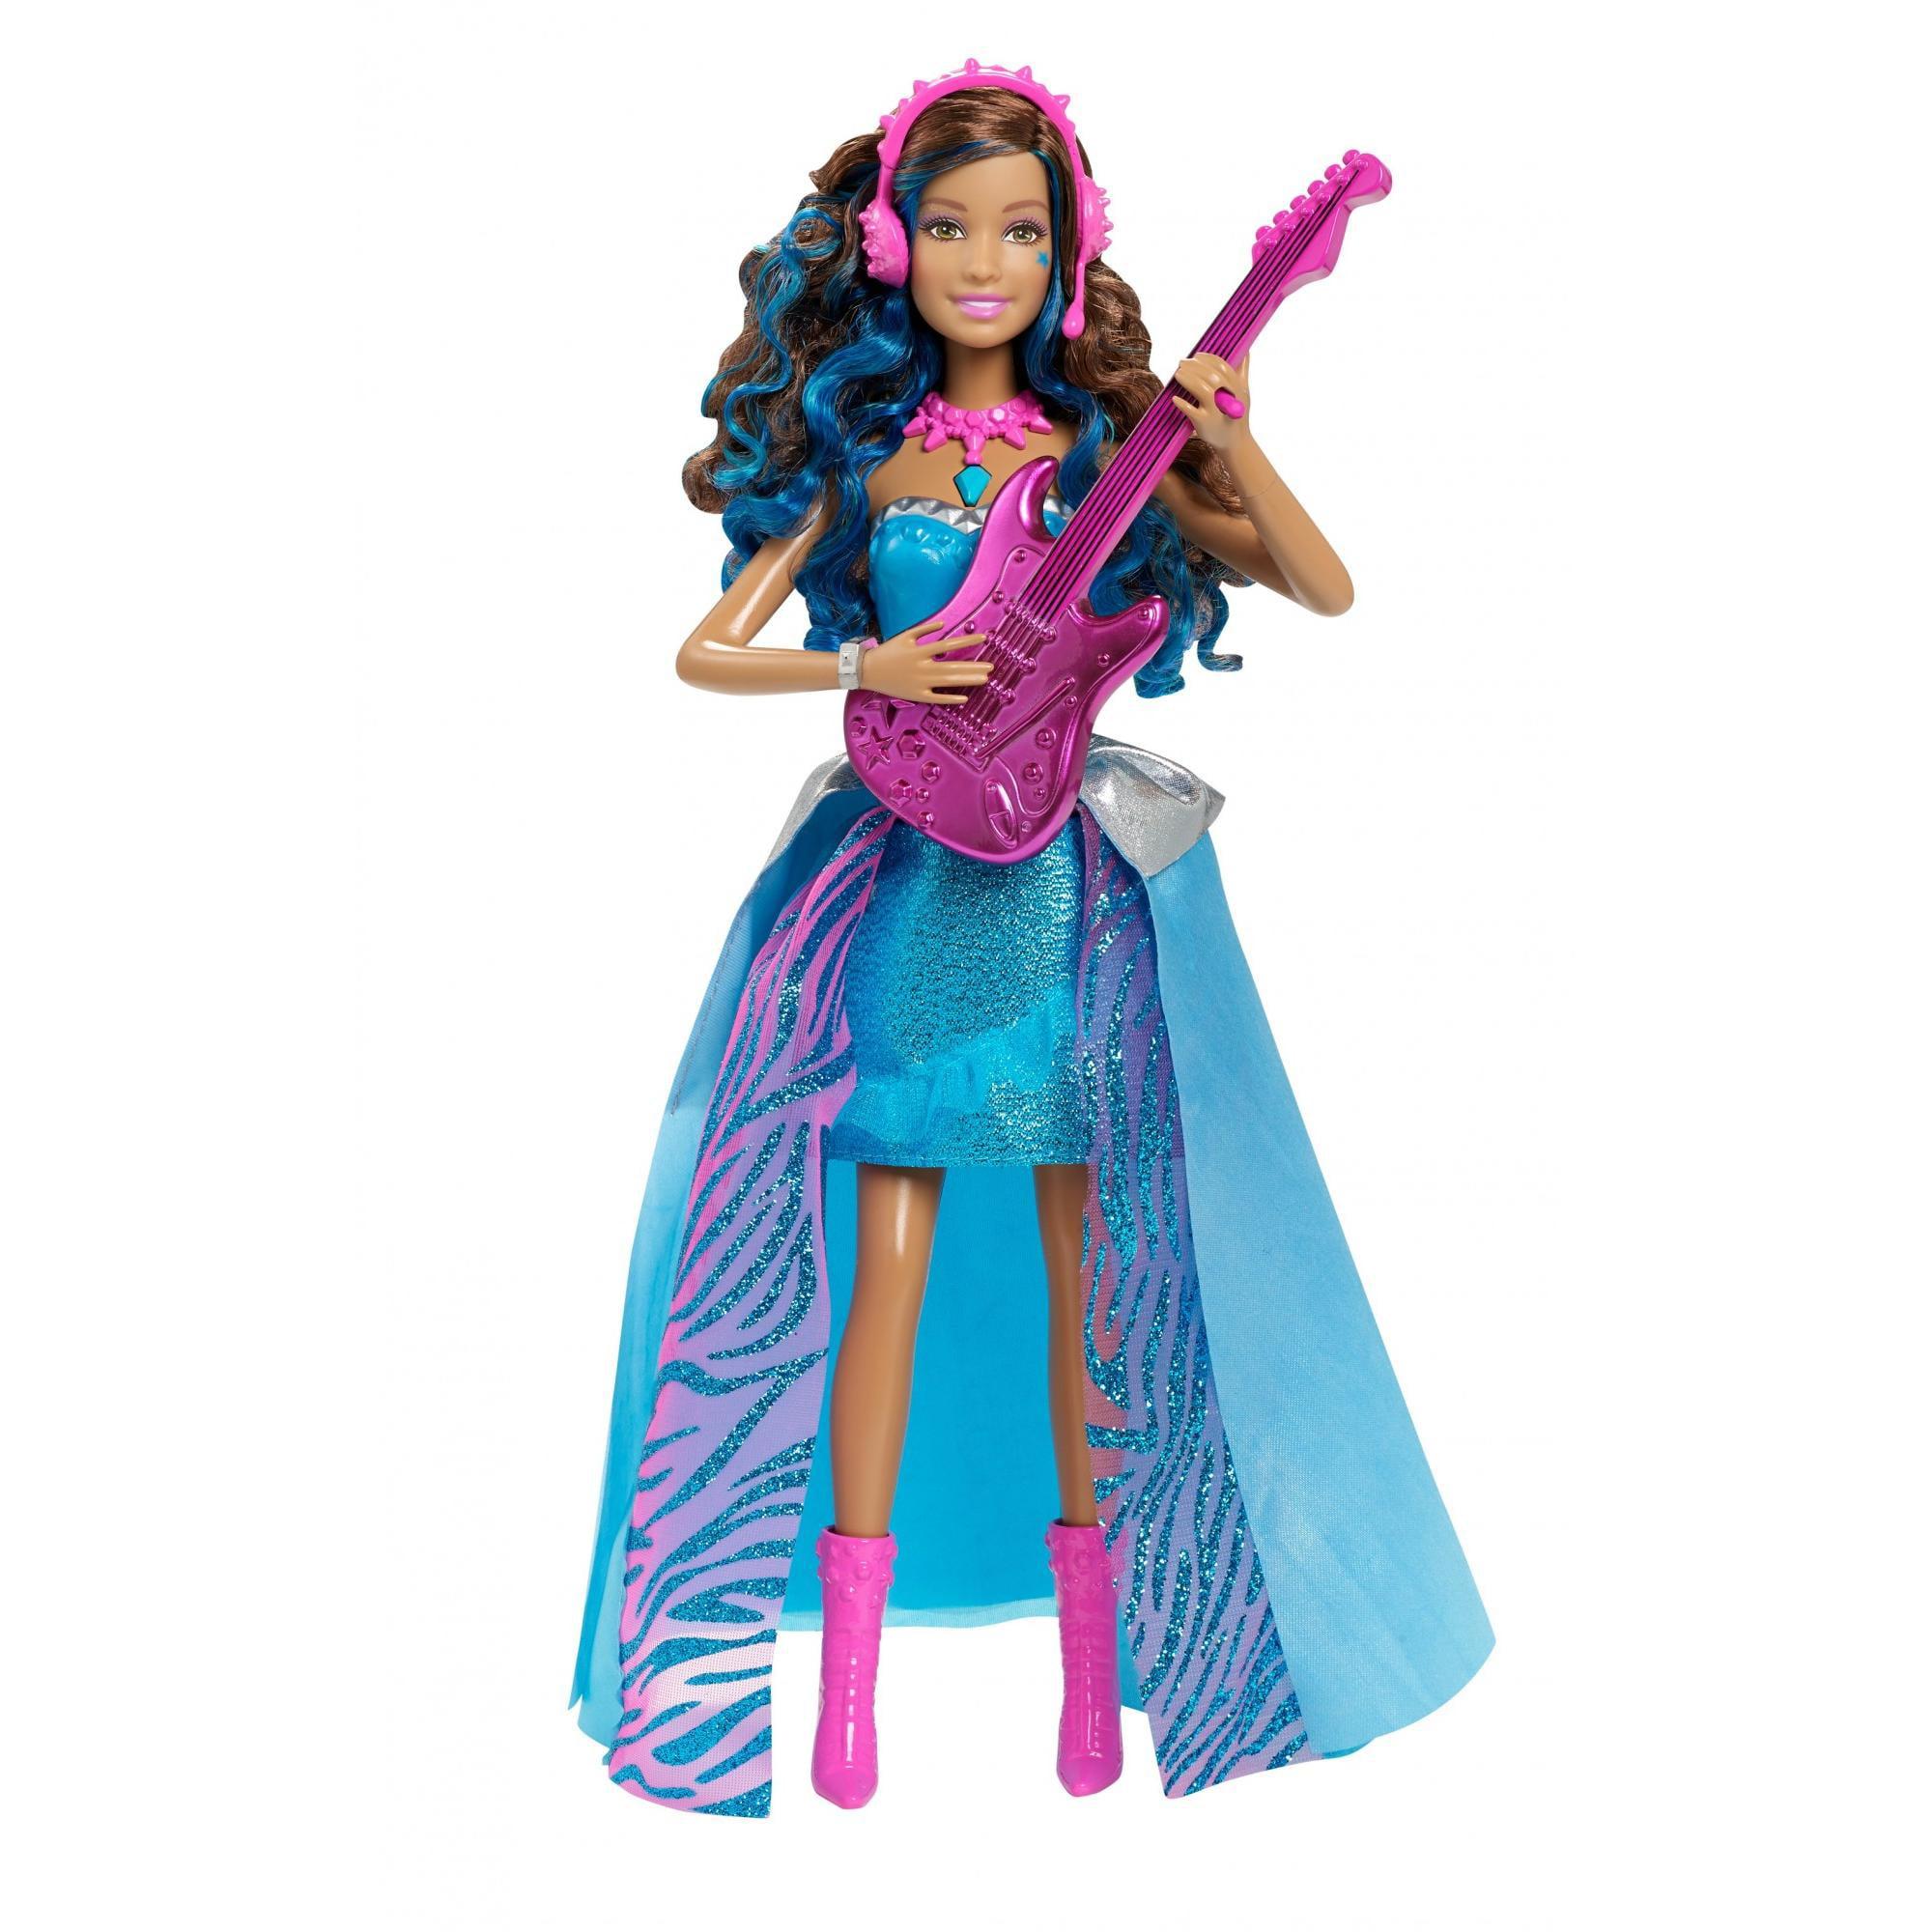 Barbie Rock N Royals Erika Doll by MATTEL INC.